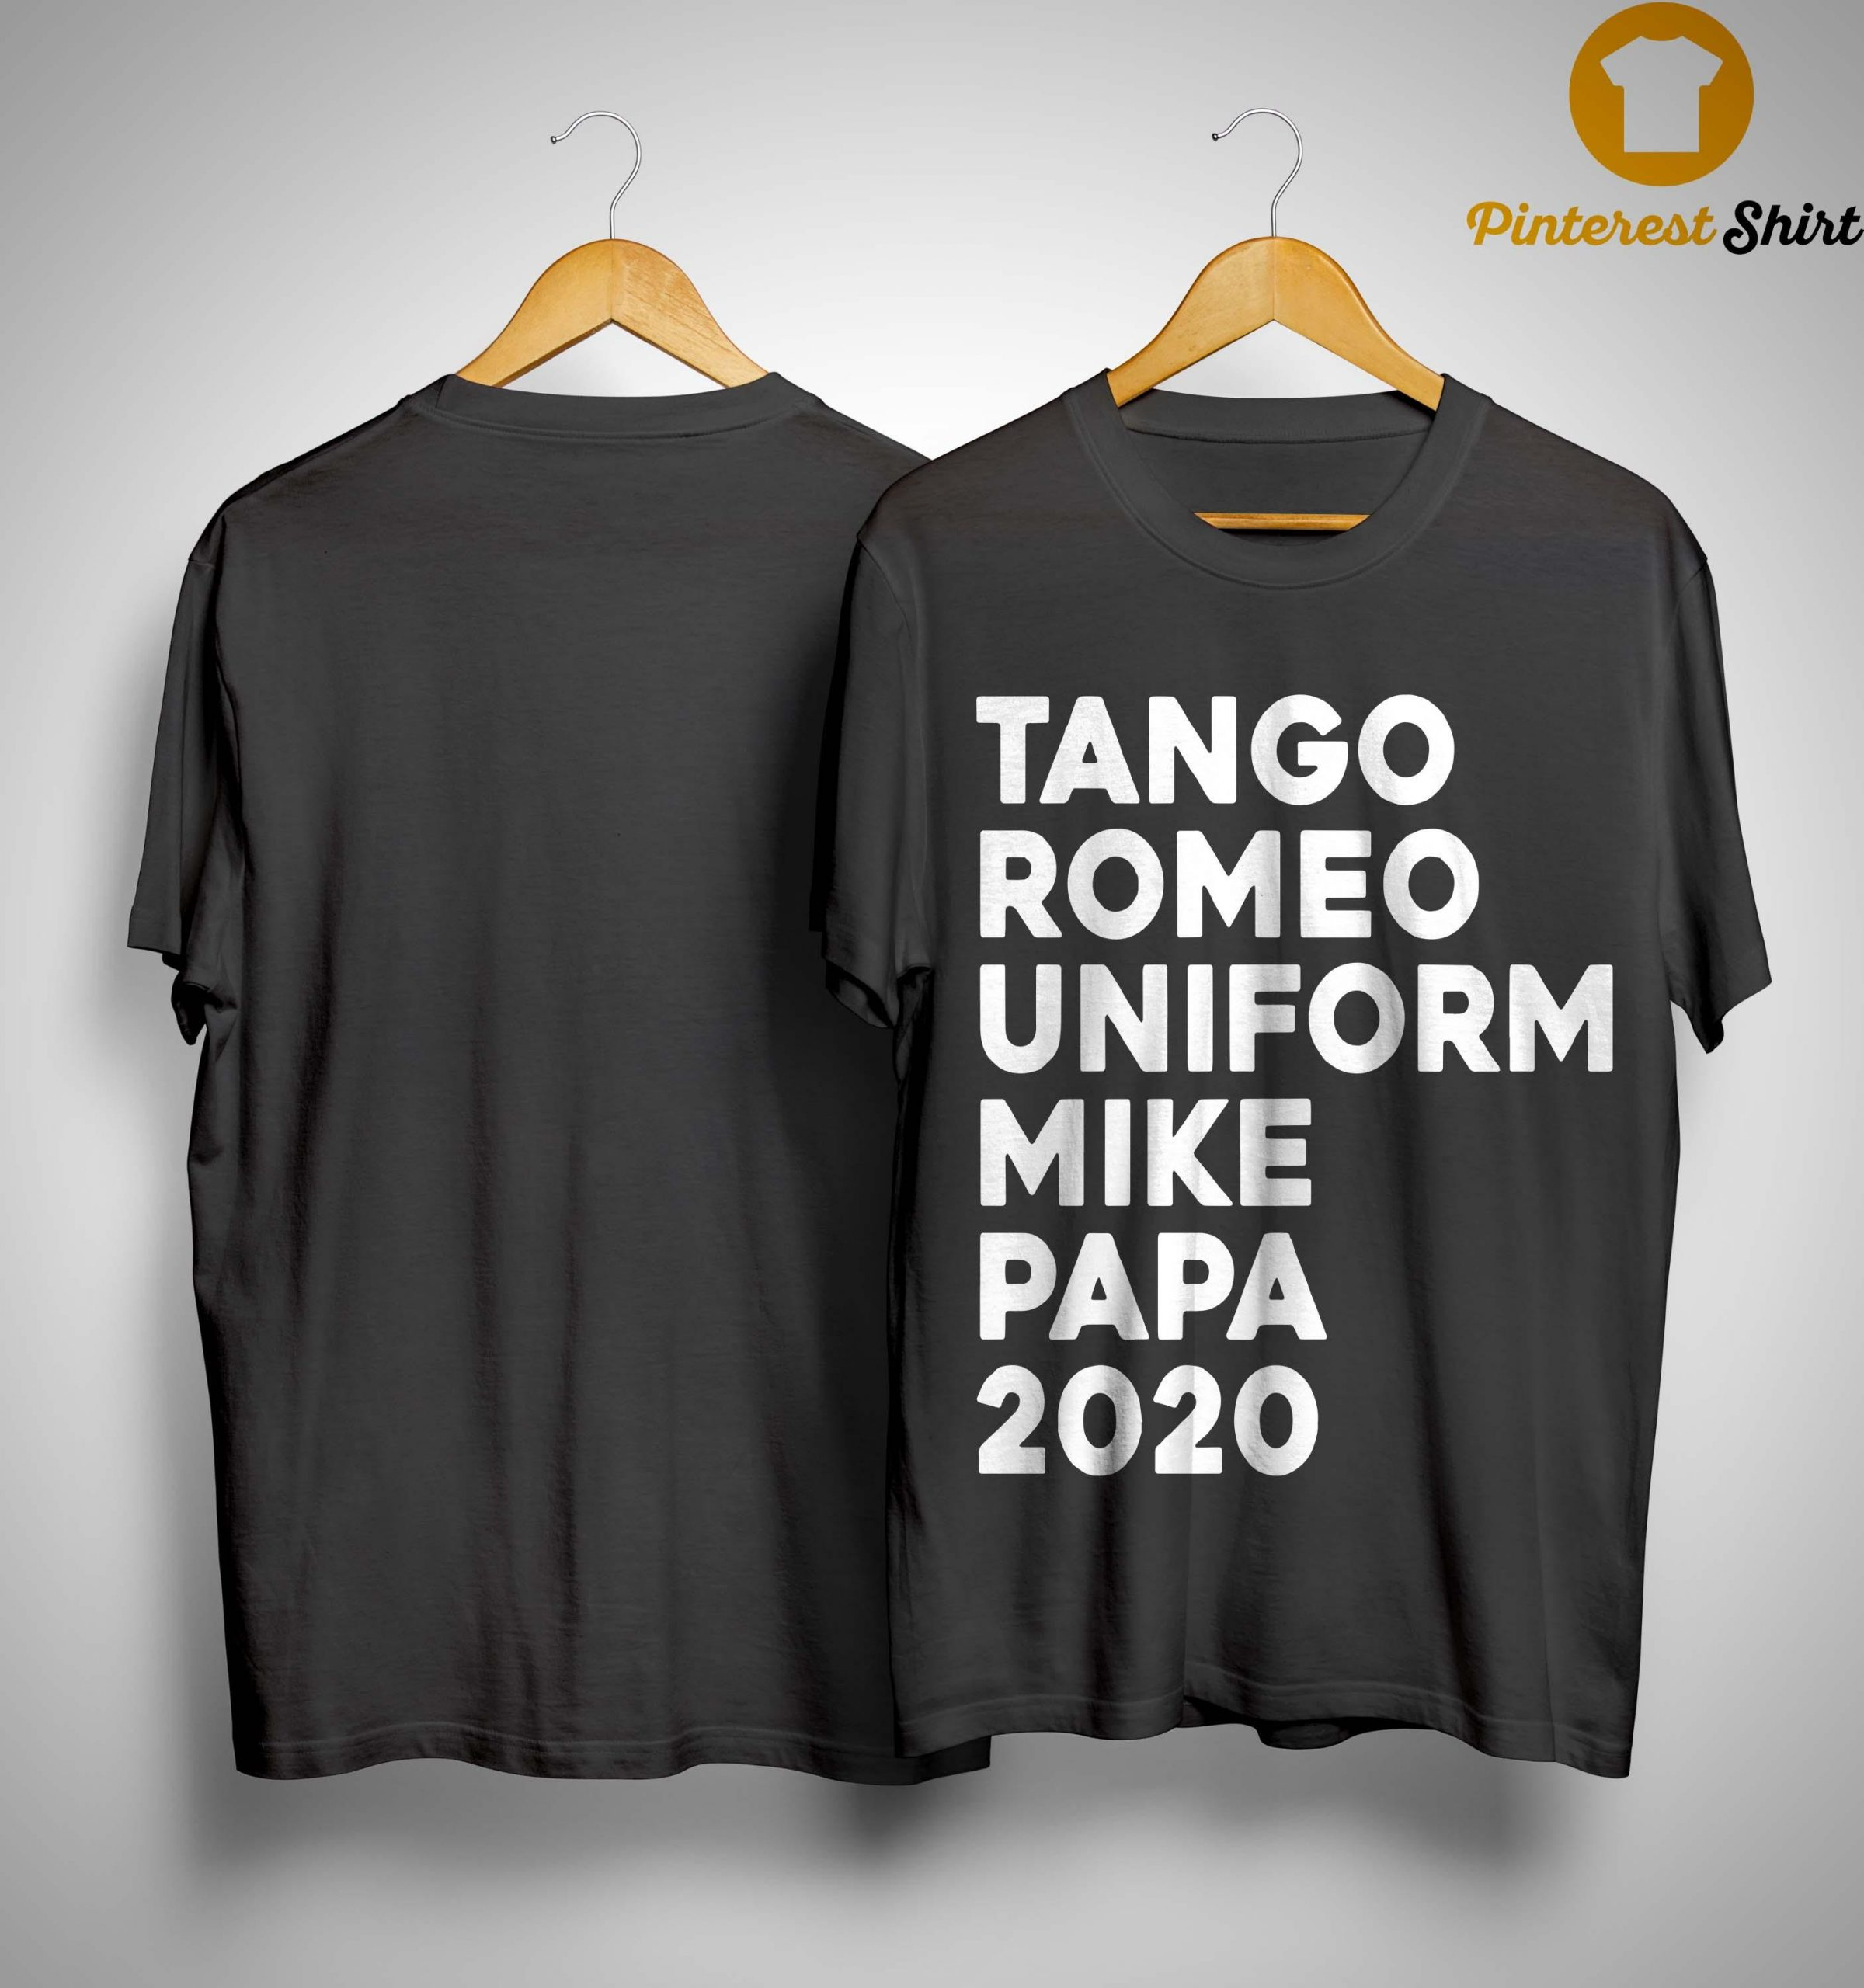 Tango Romeo Uniform Mike Papa 2020 Shirt